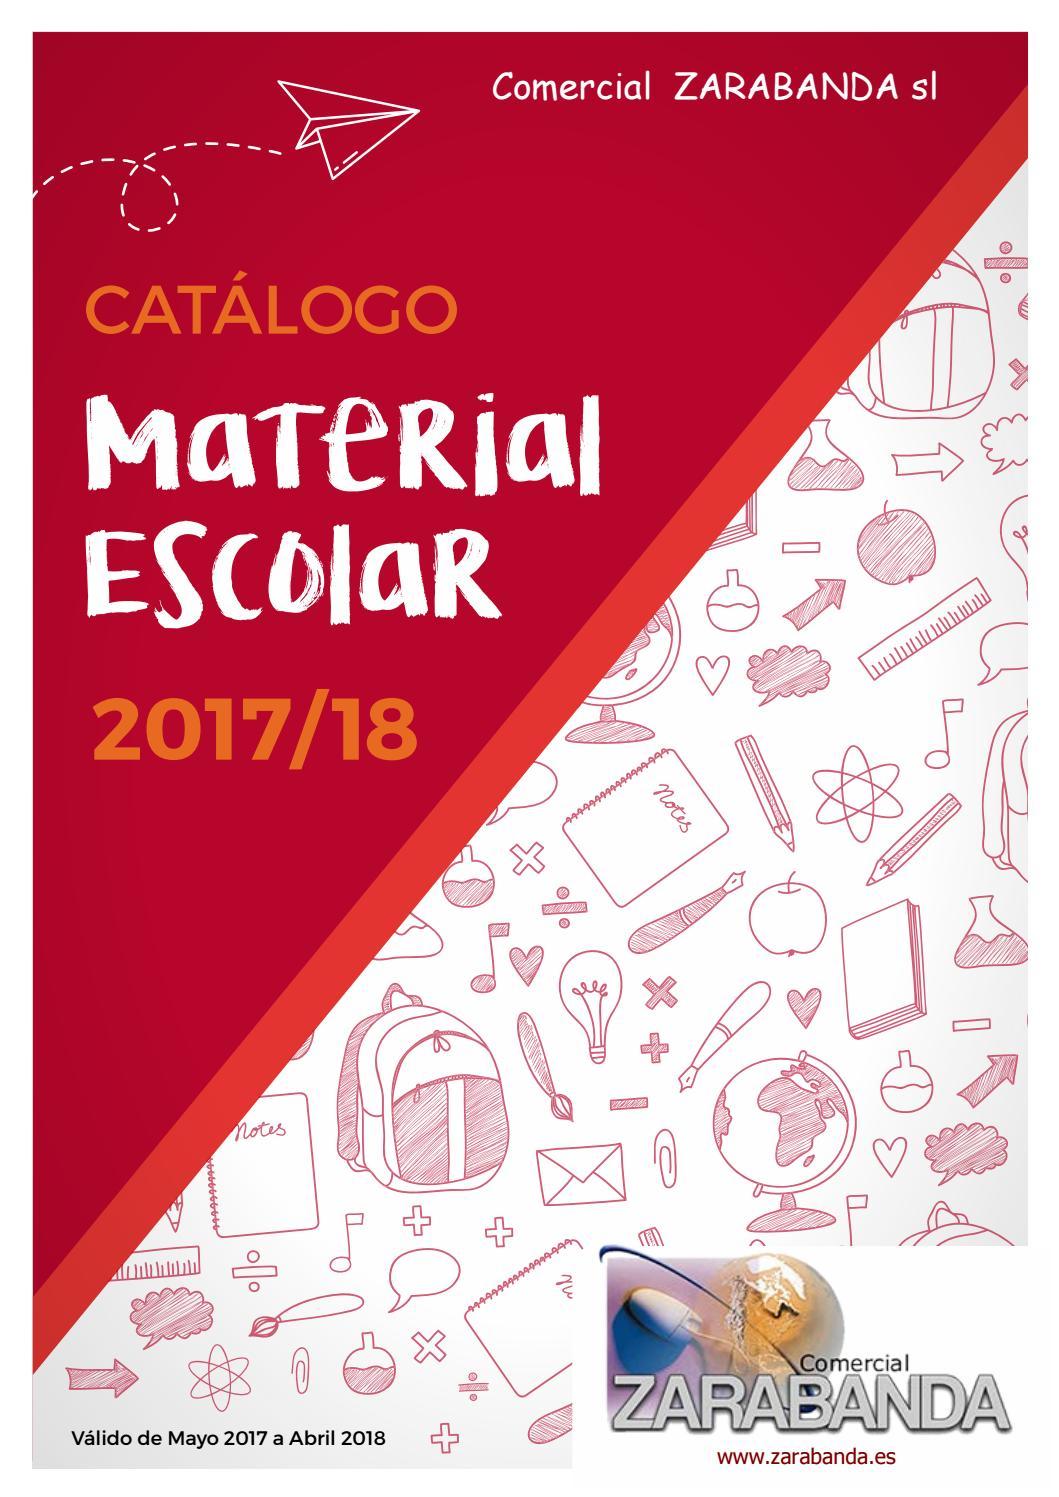 Catalogo colegios zarabanda by Comercial Zarabanda - issuu